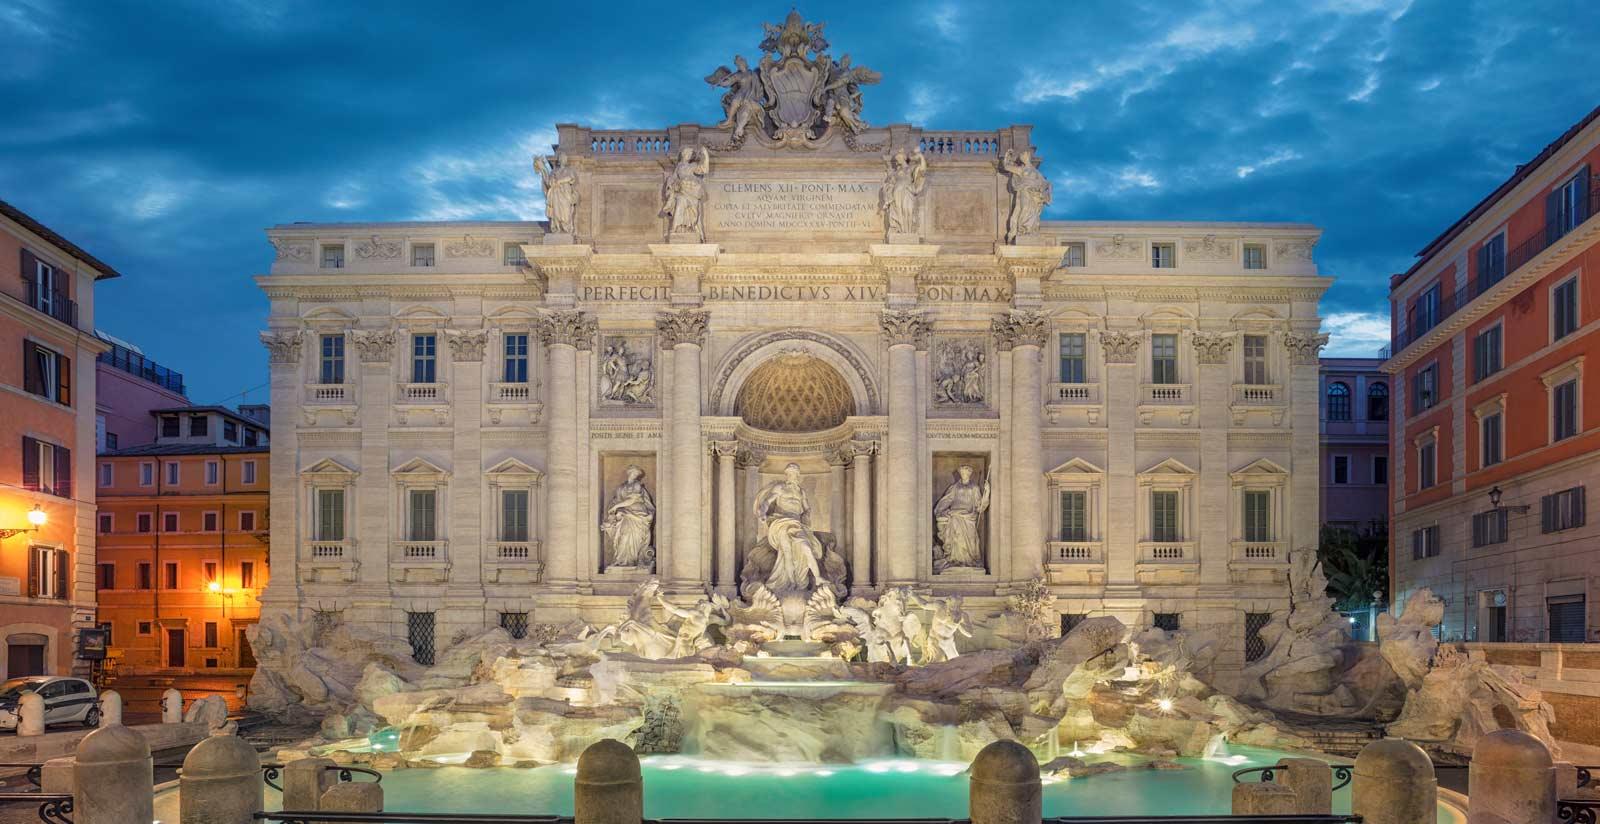 Inurl php cost of vatican tour возврат денег 13 процентный налог